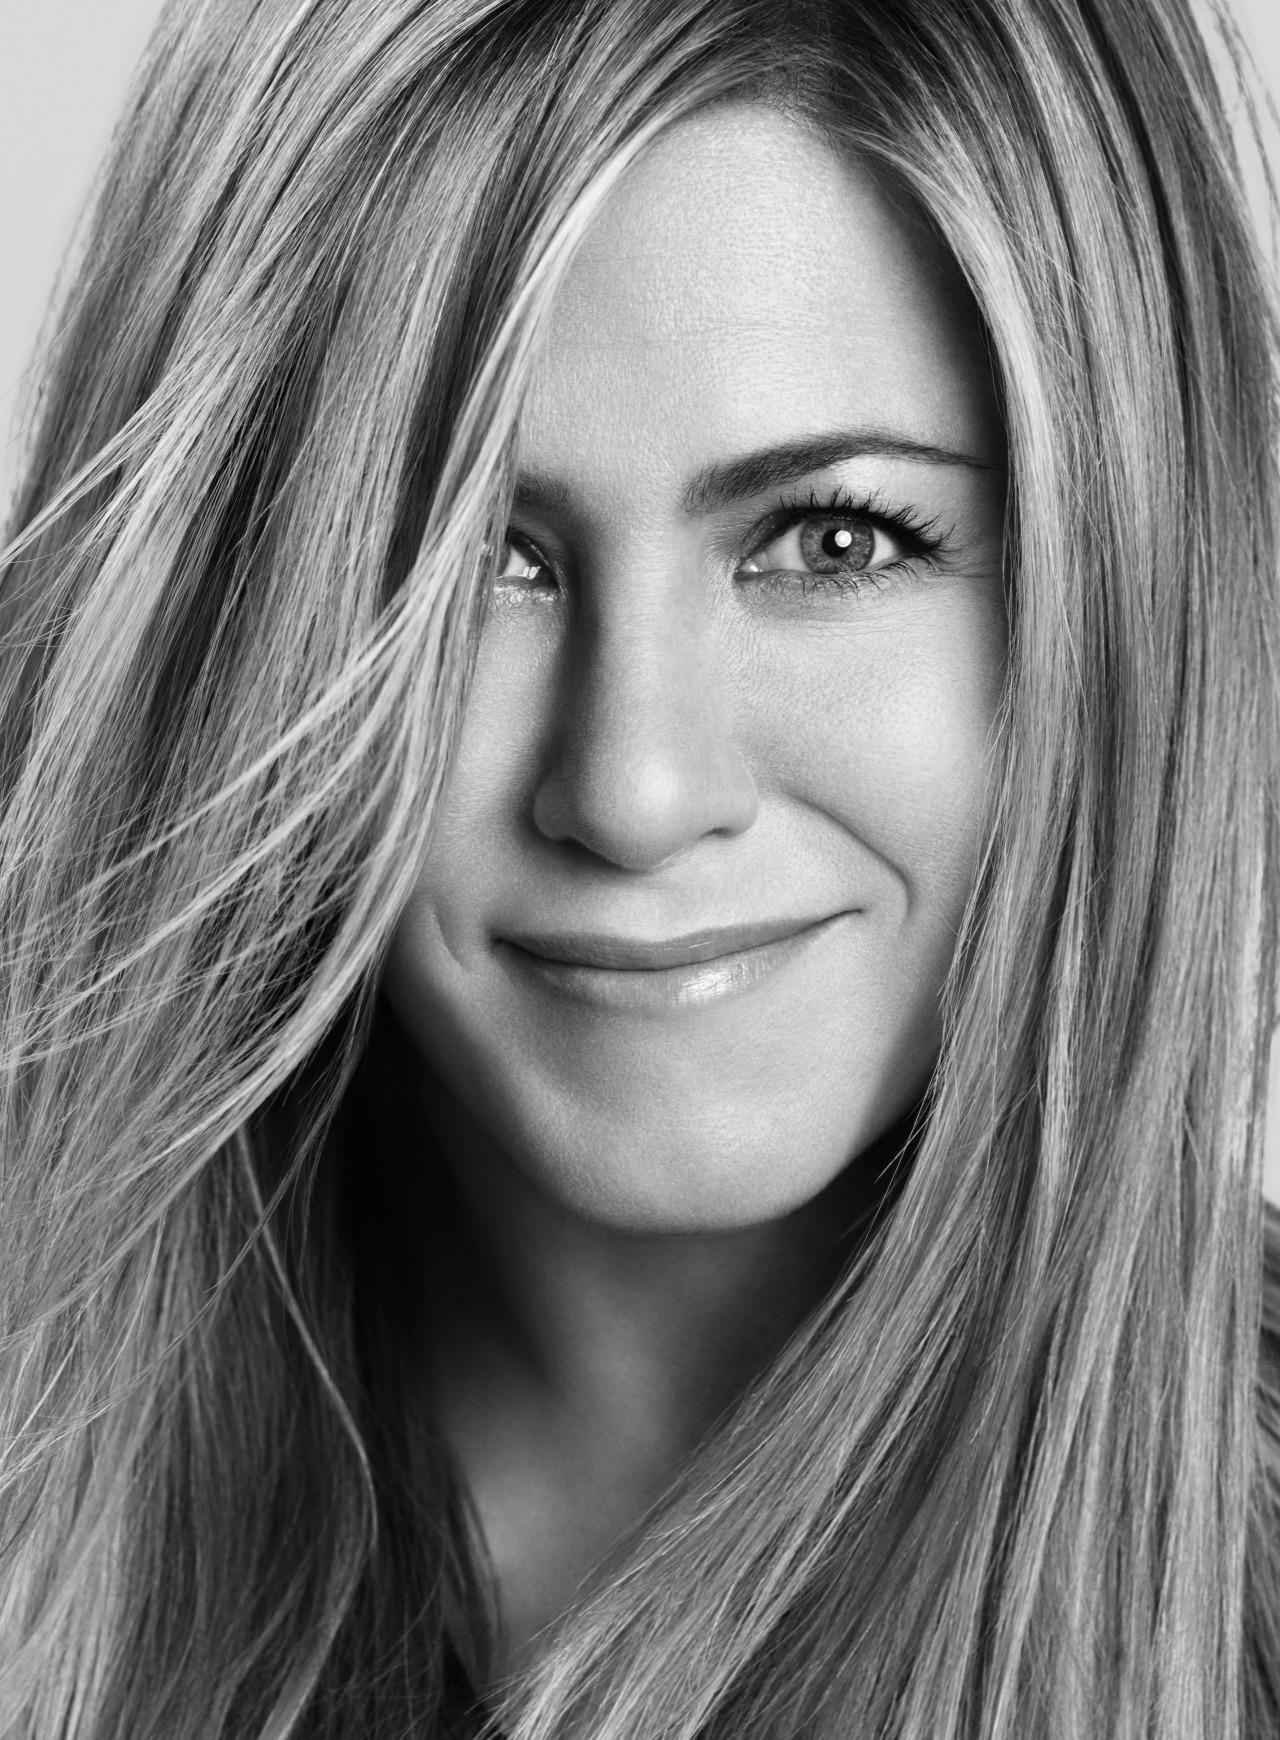 Pin On Jennifer Aniston S Amazing Style And Friends